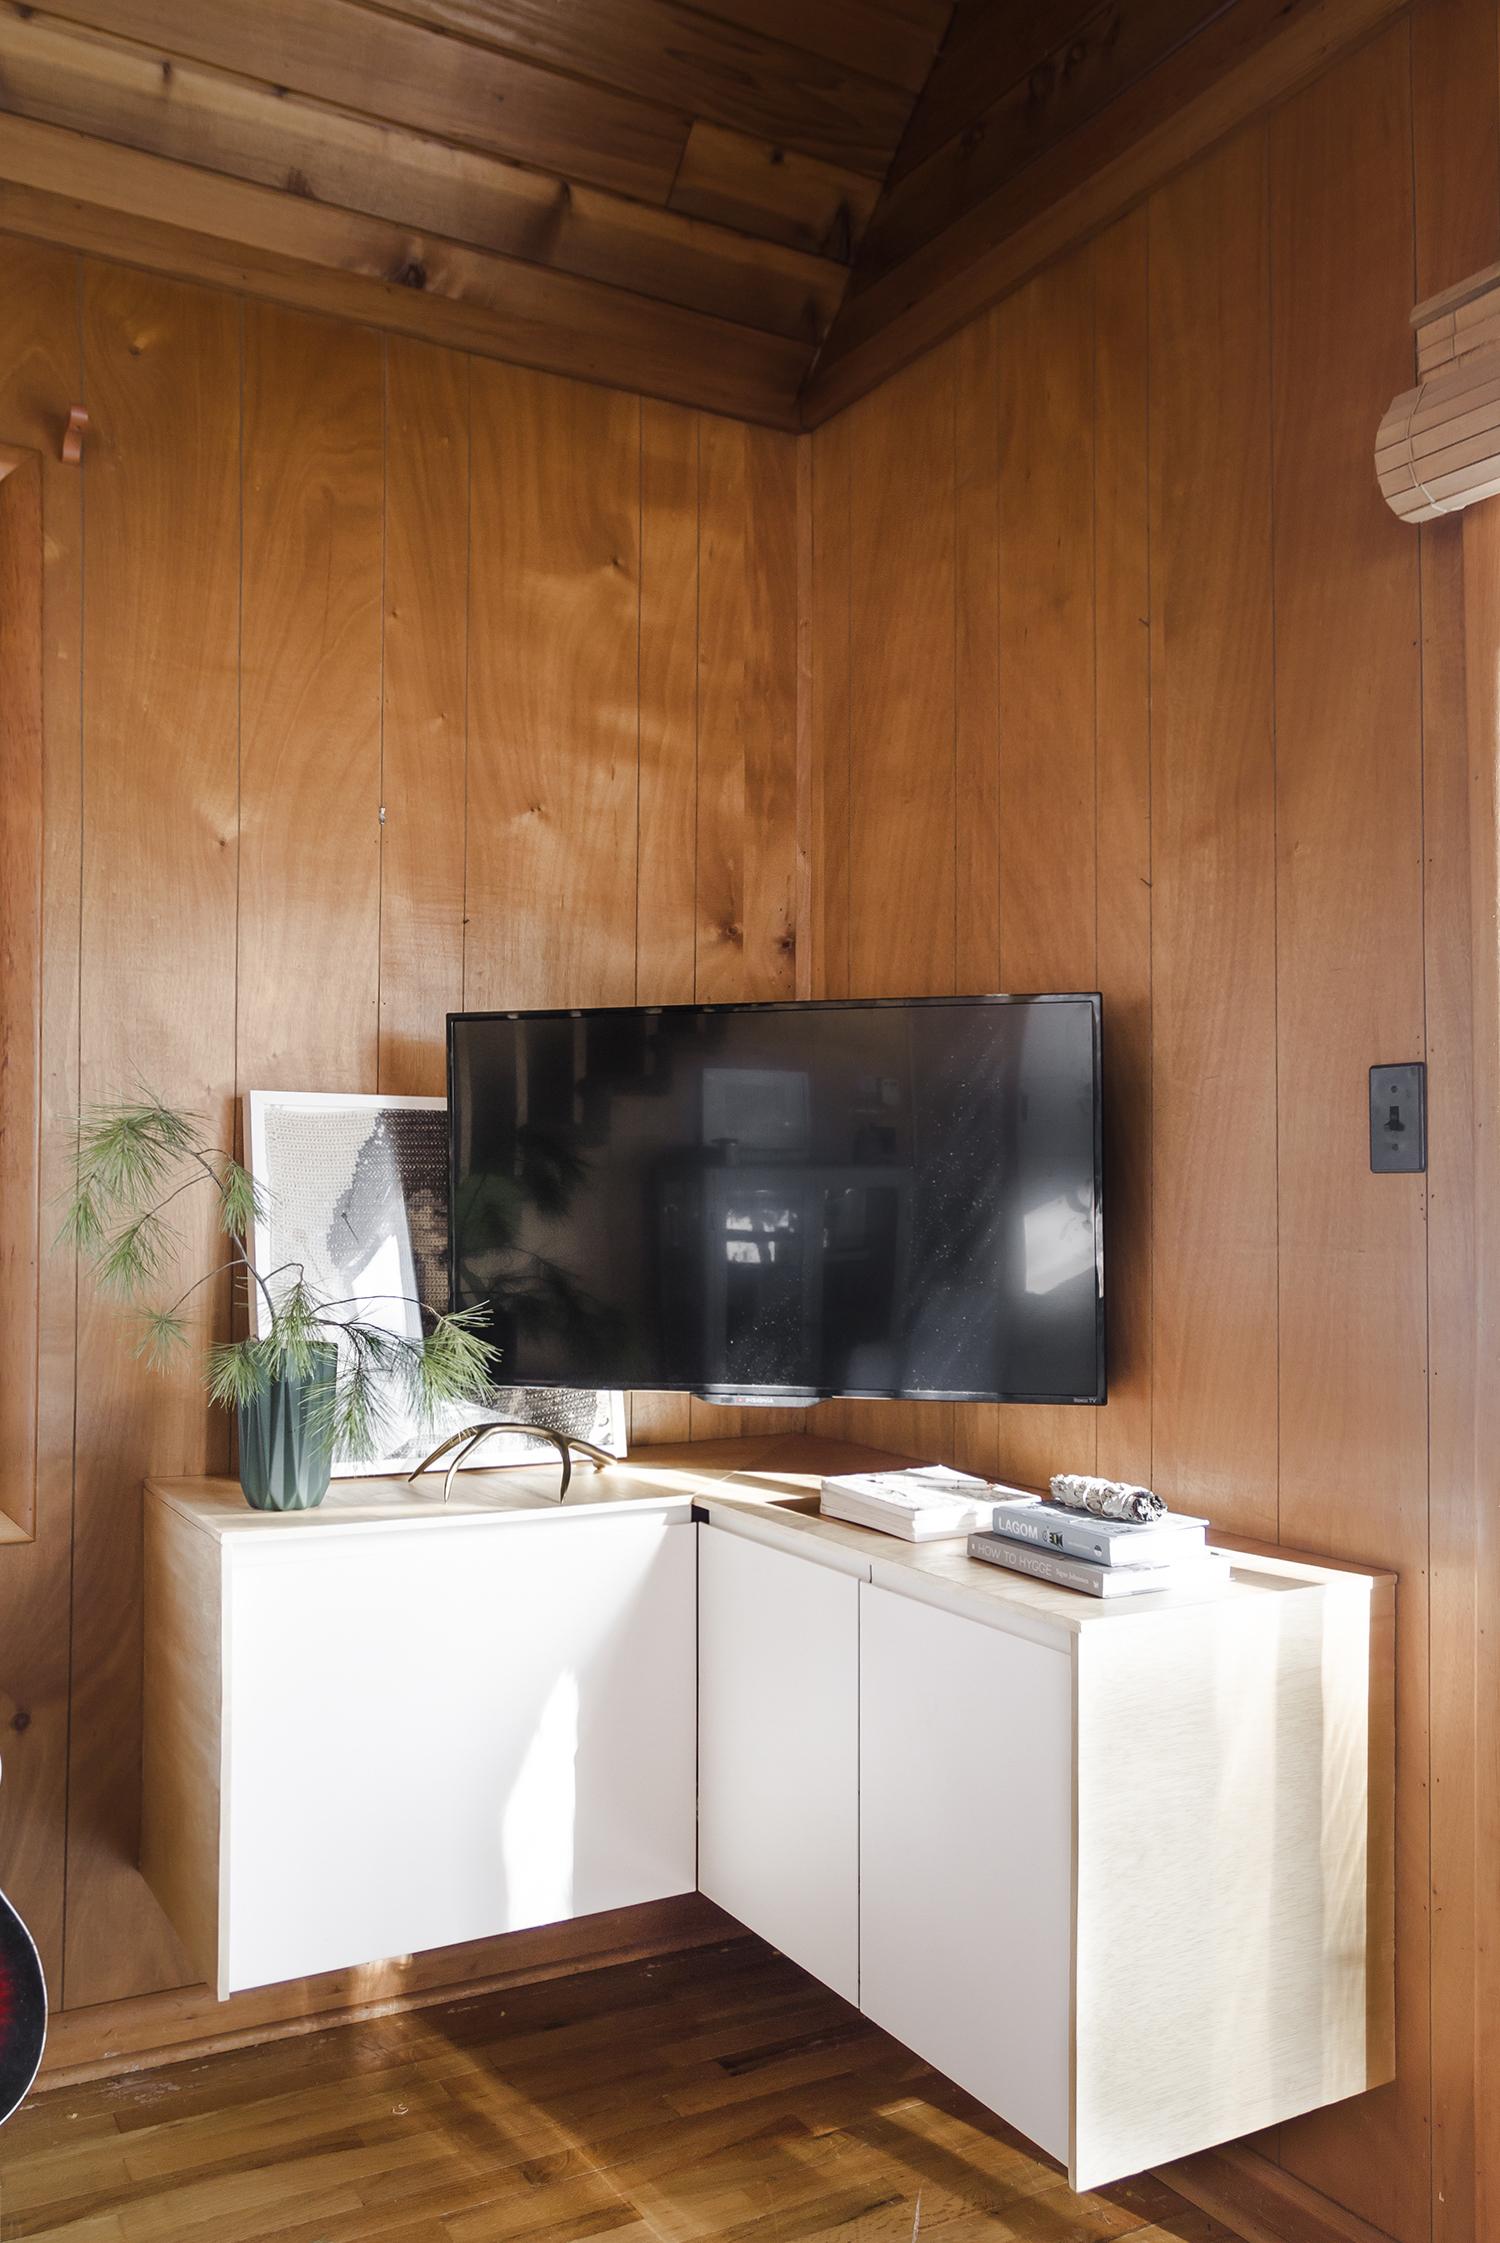 Deucecities Henhouse | Custom Corner TV Credenza using Ikea Kitchen Cabinets